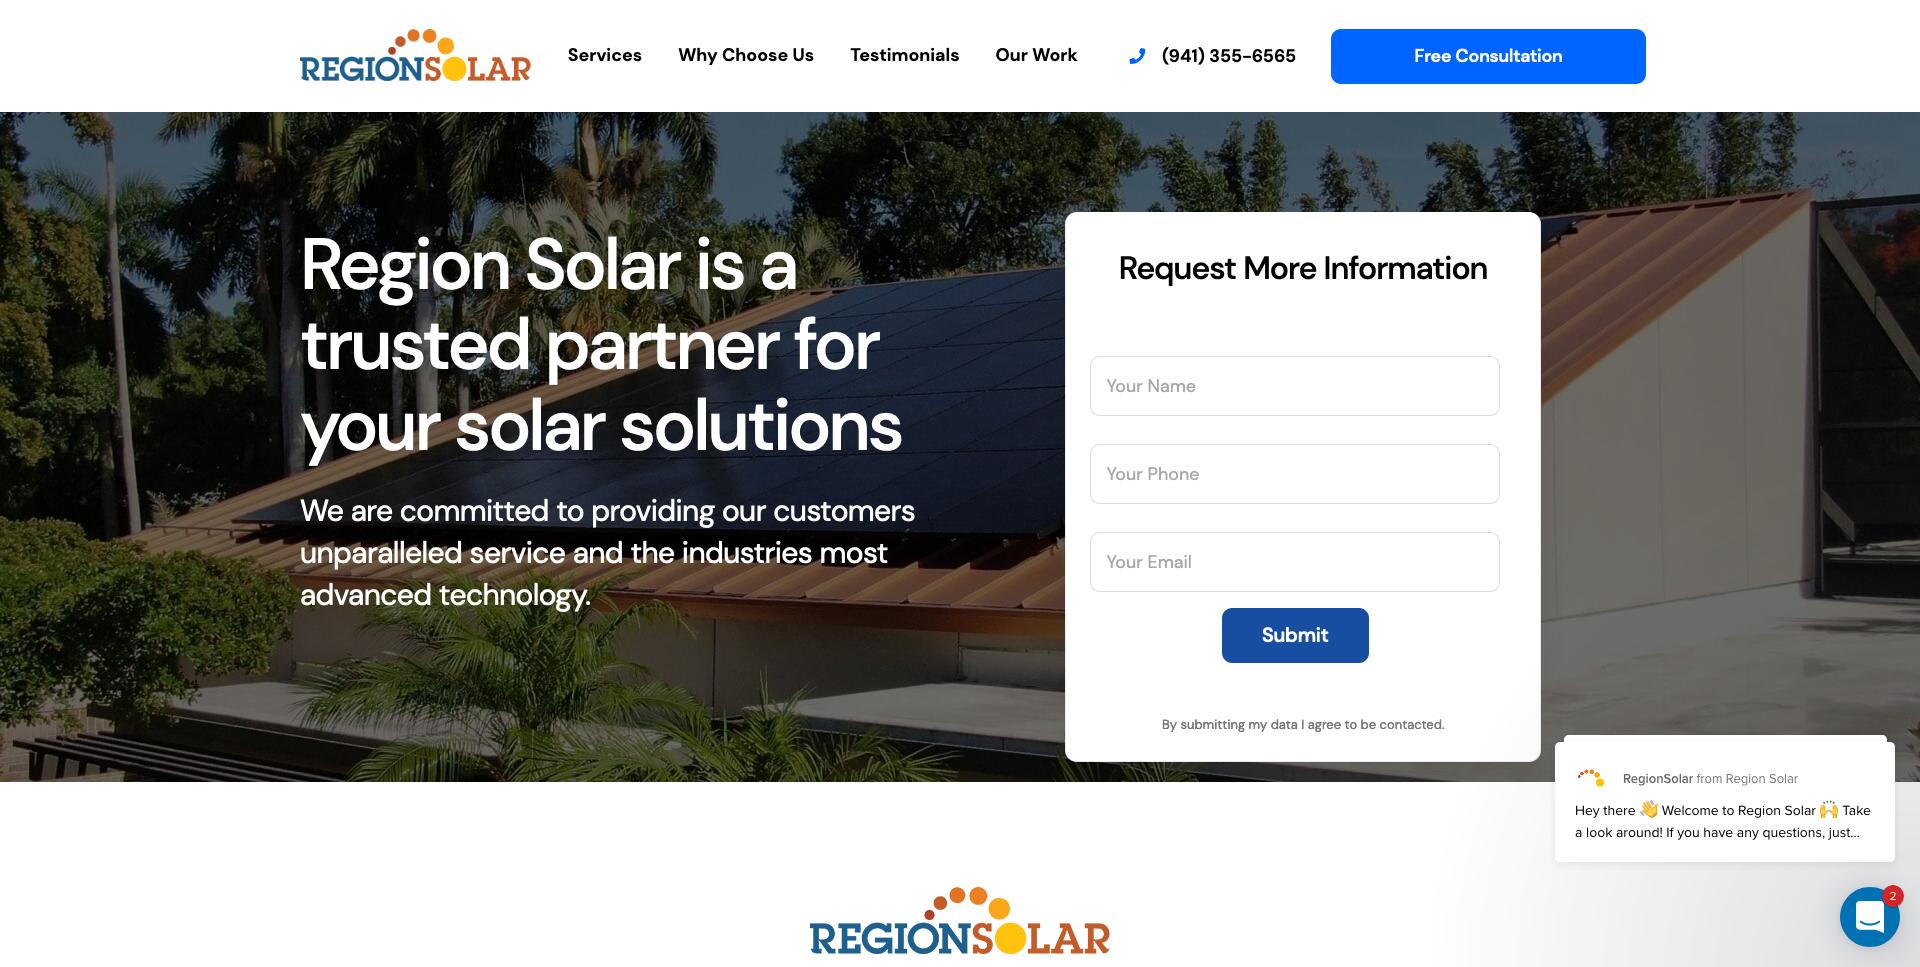 Fold - Region Solar – your trusted partner for solar solutions_ - freeconsultation.regionsolar.co